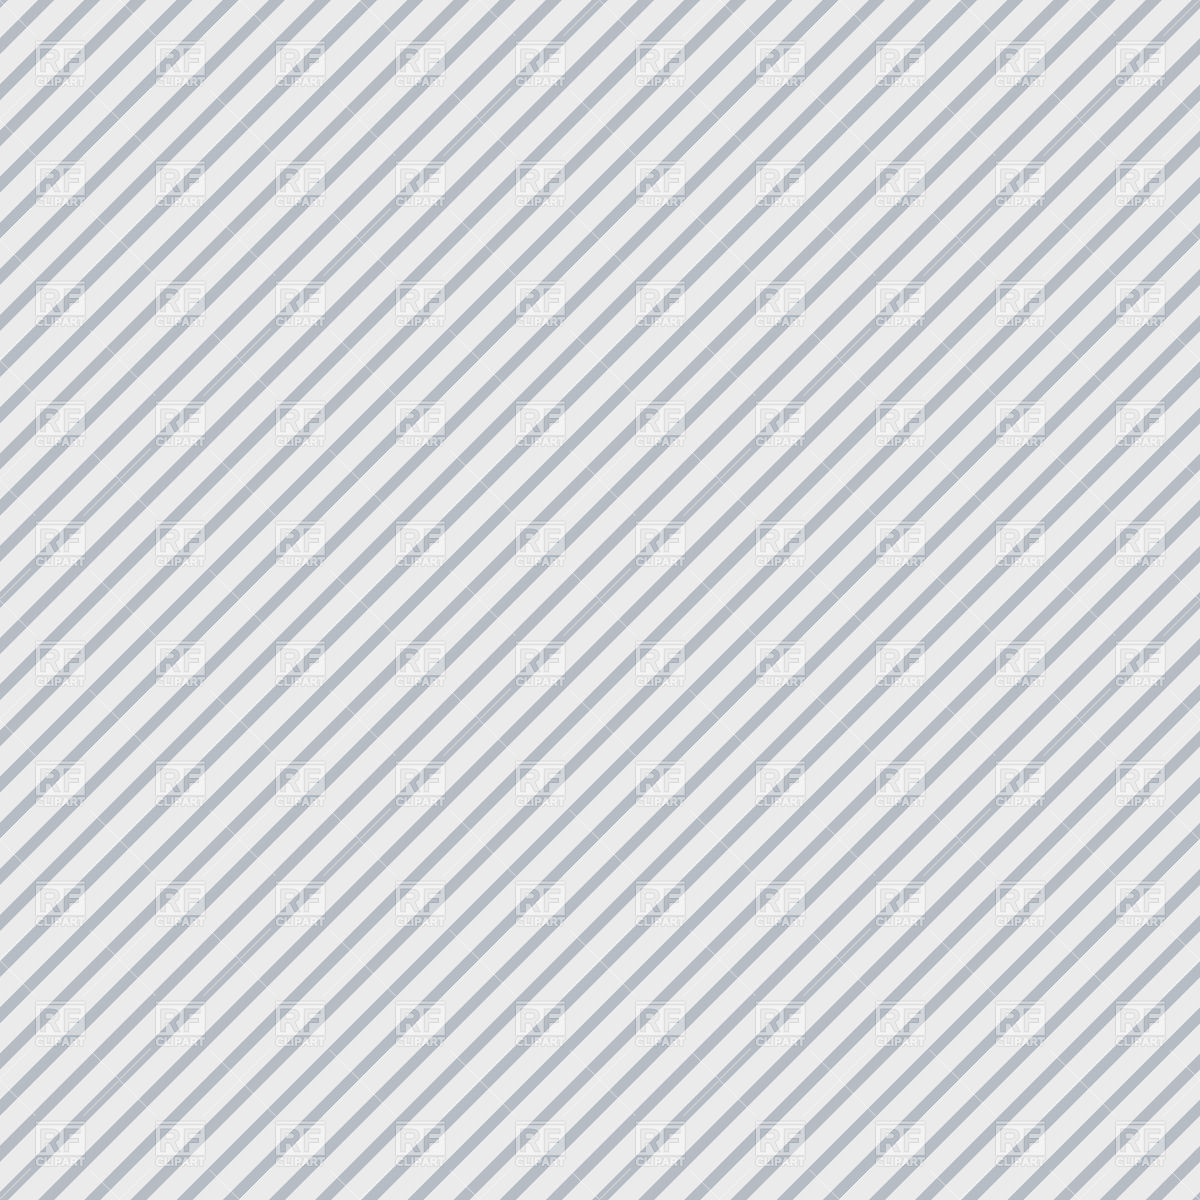 Diagonal Line Pattern Vector